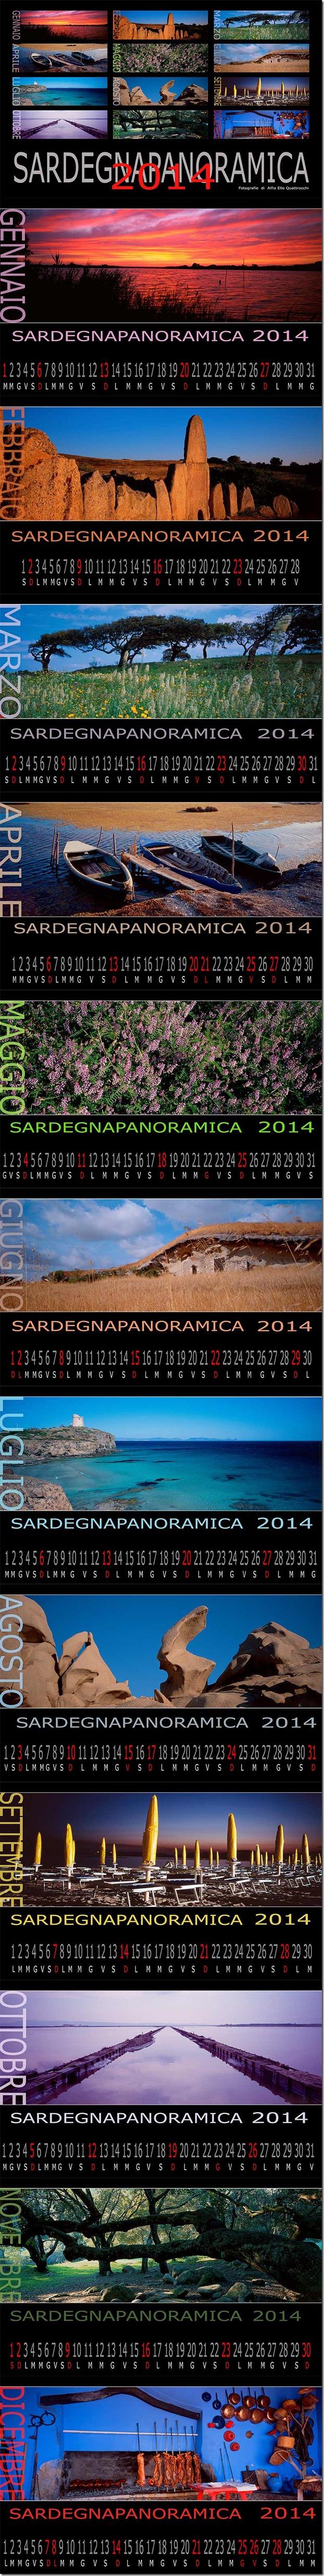 Calendario-Sardegna-Panoramica-2014